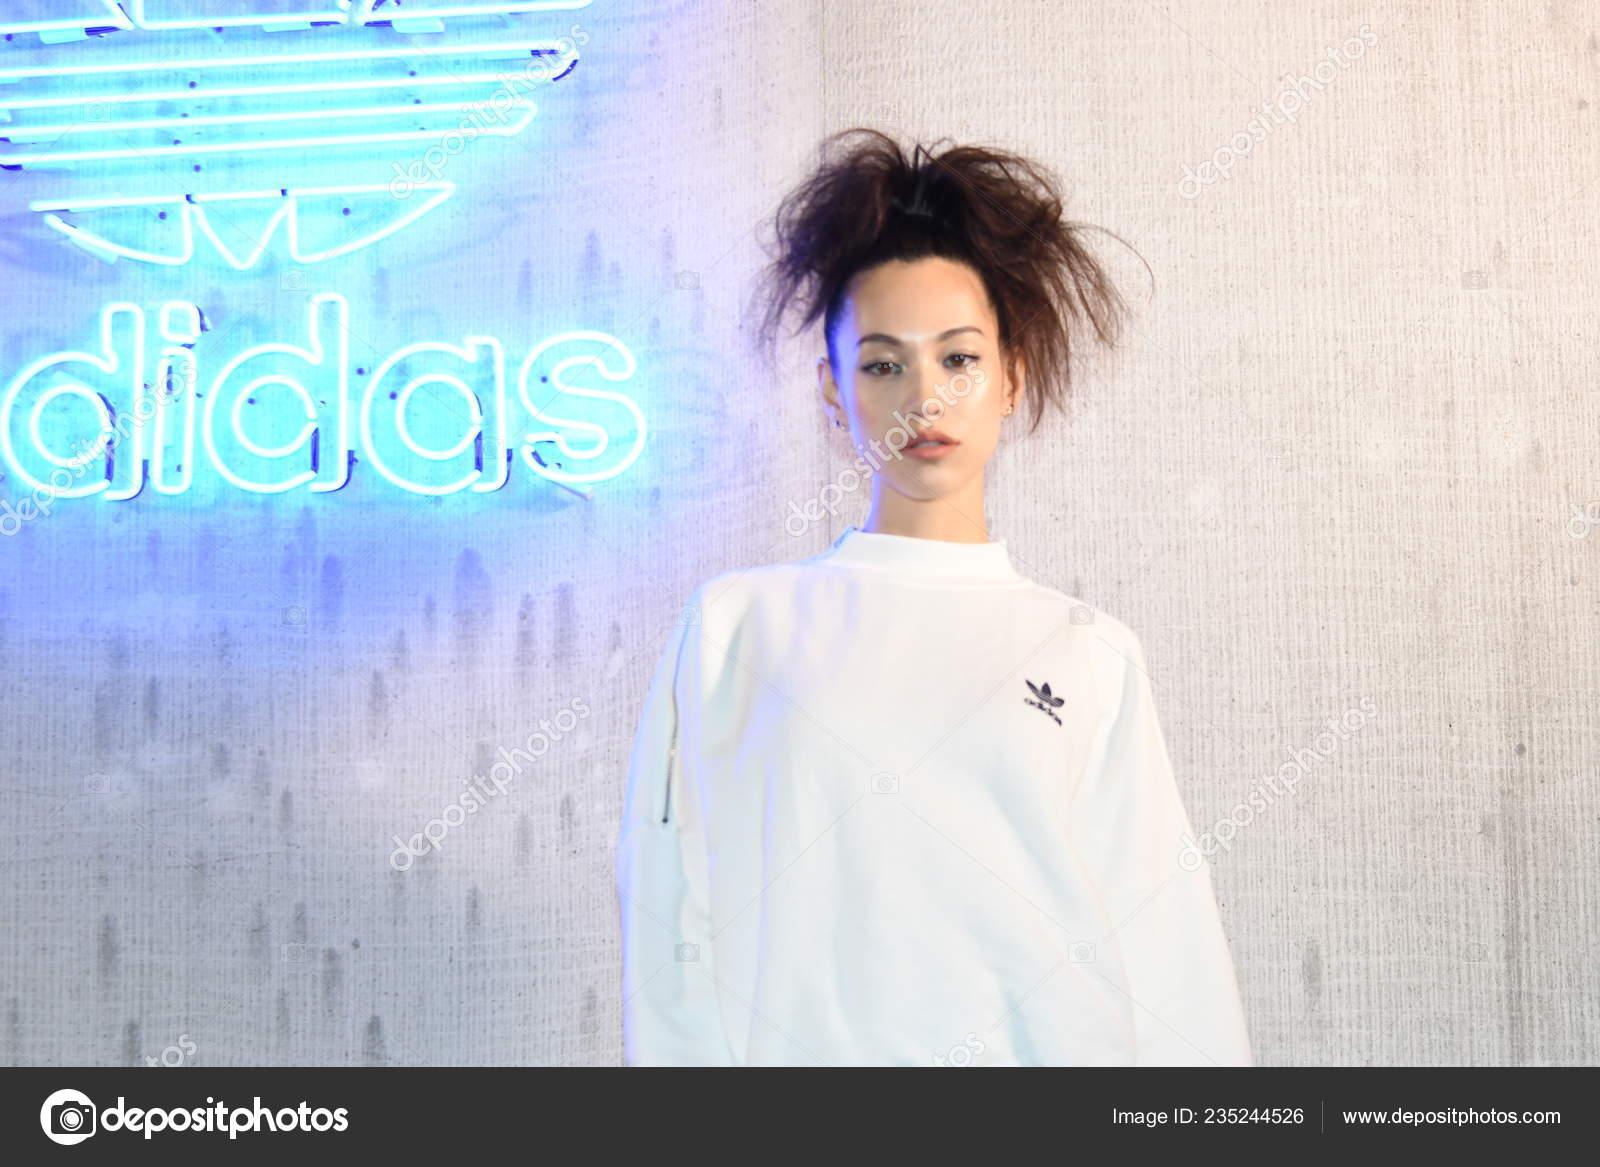 Adidas China Originals